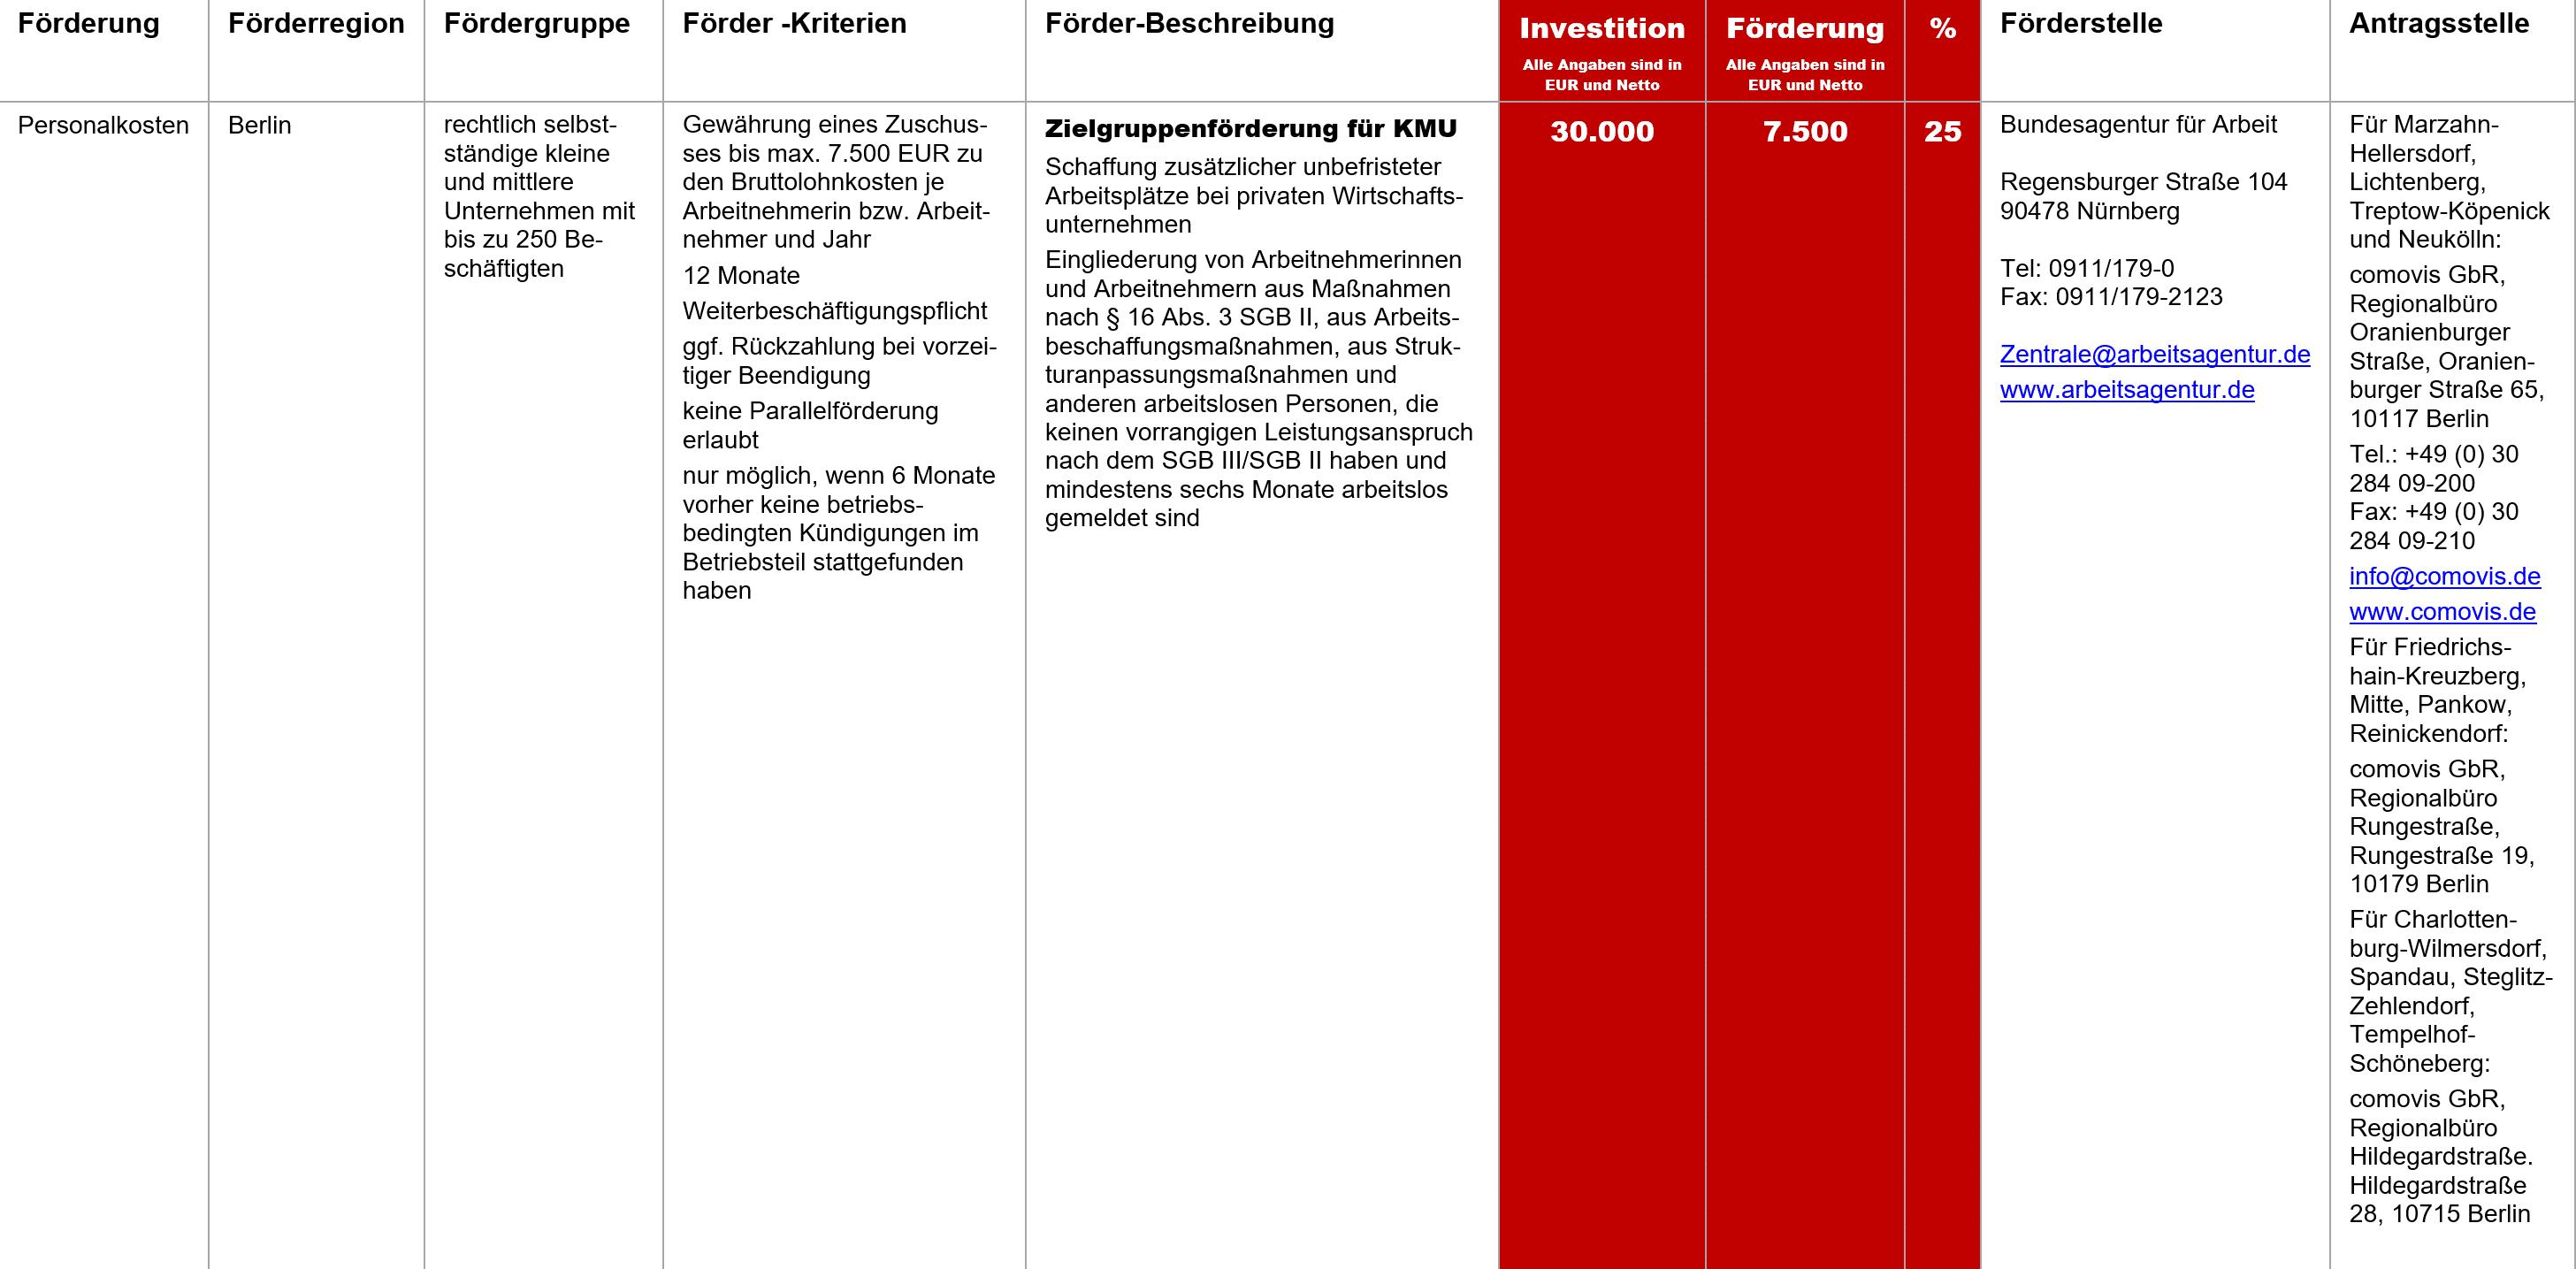 Zielgruppenförderung KMU, Fördermittel – Zielgruppenförderung für KMU